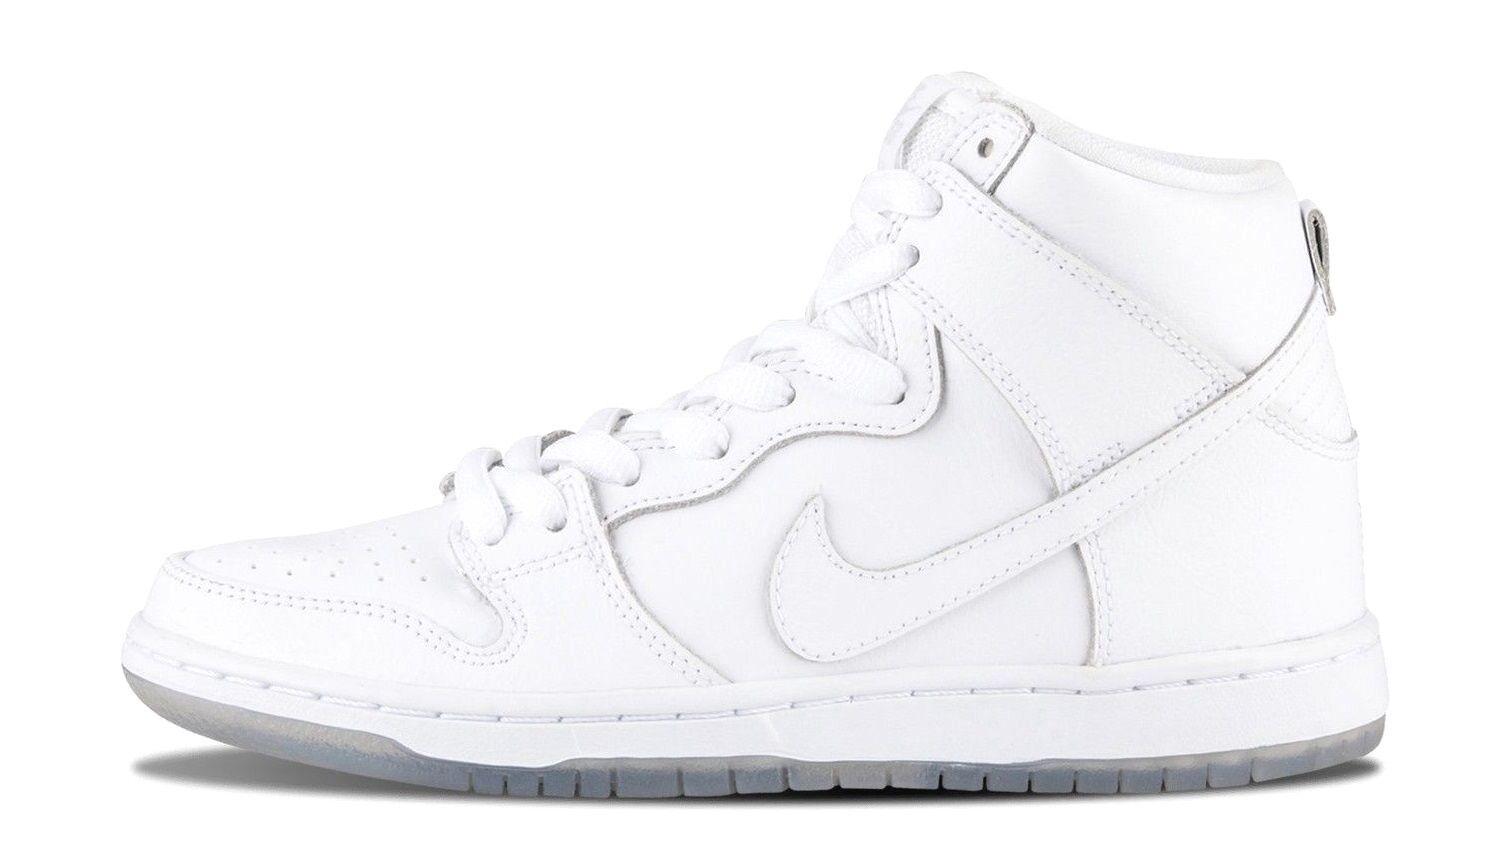 Nike DUNK HIGH PRO SB White-White Light Base Grey Discounted (520) Men's Shoes